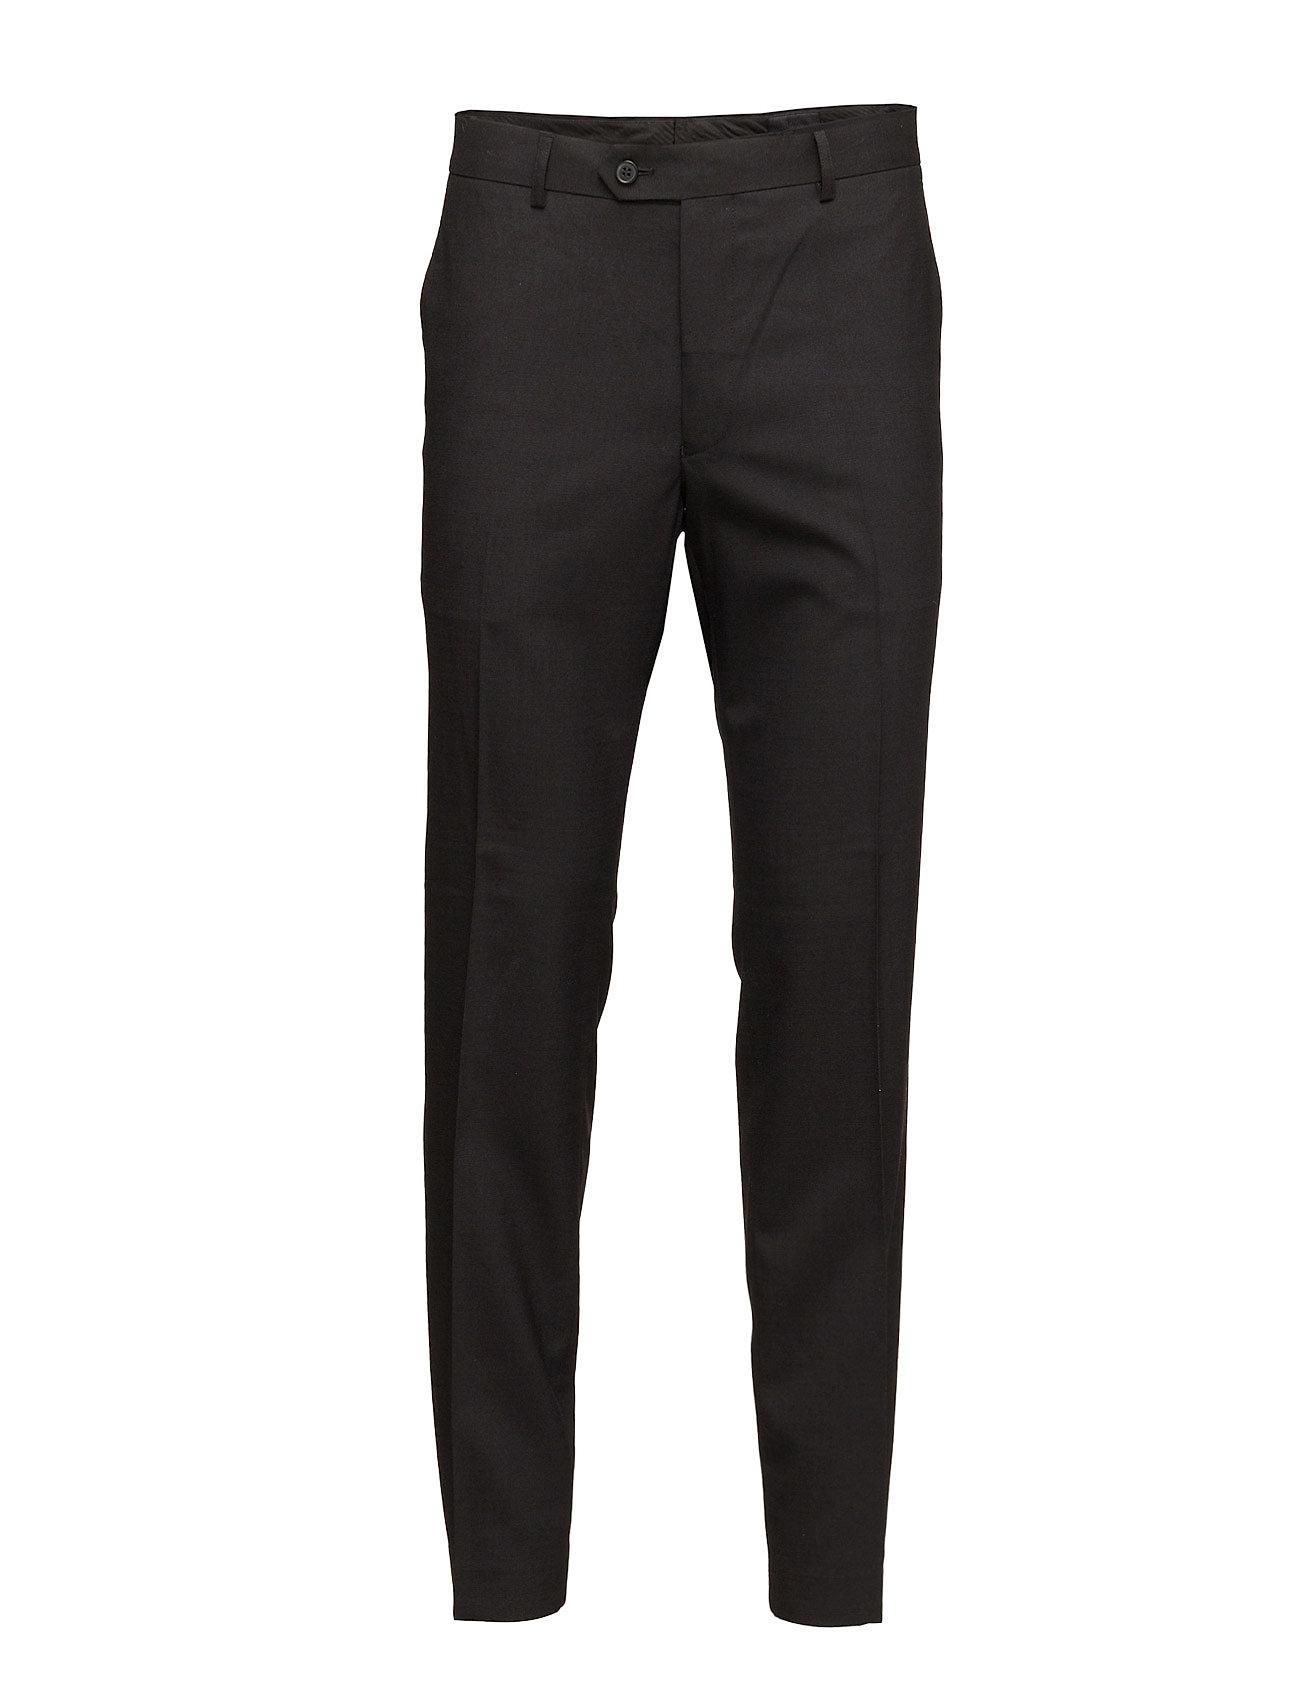 Iceman 480 NOS PANTS - BLACK